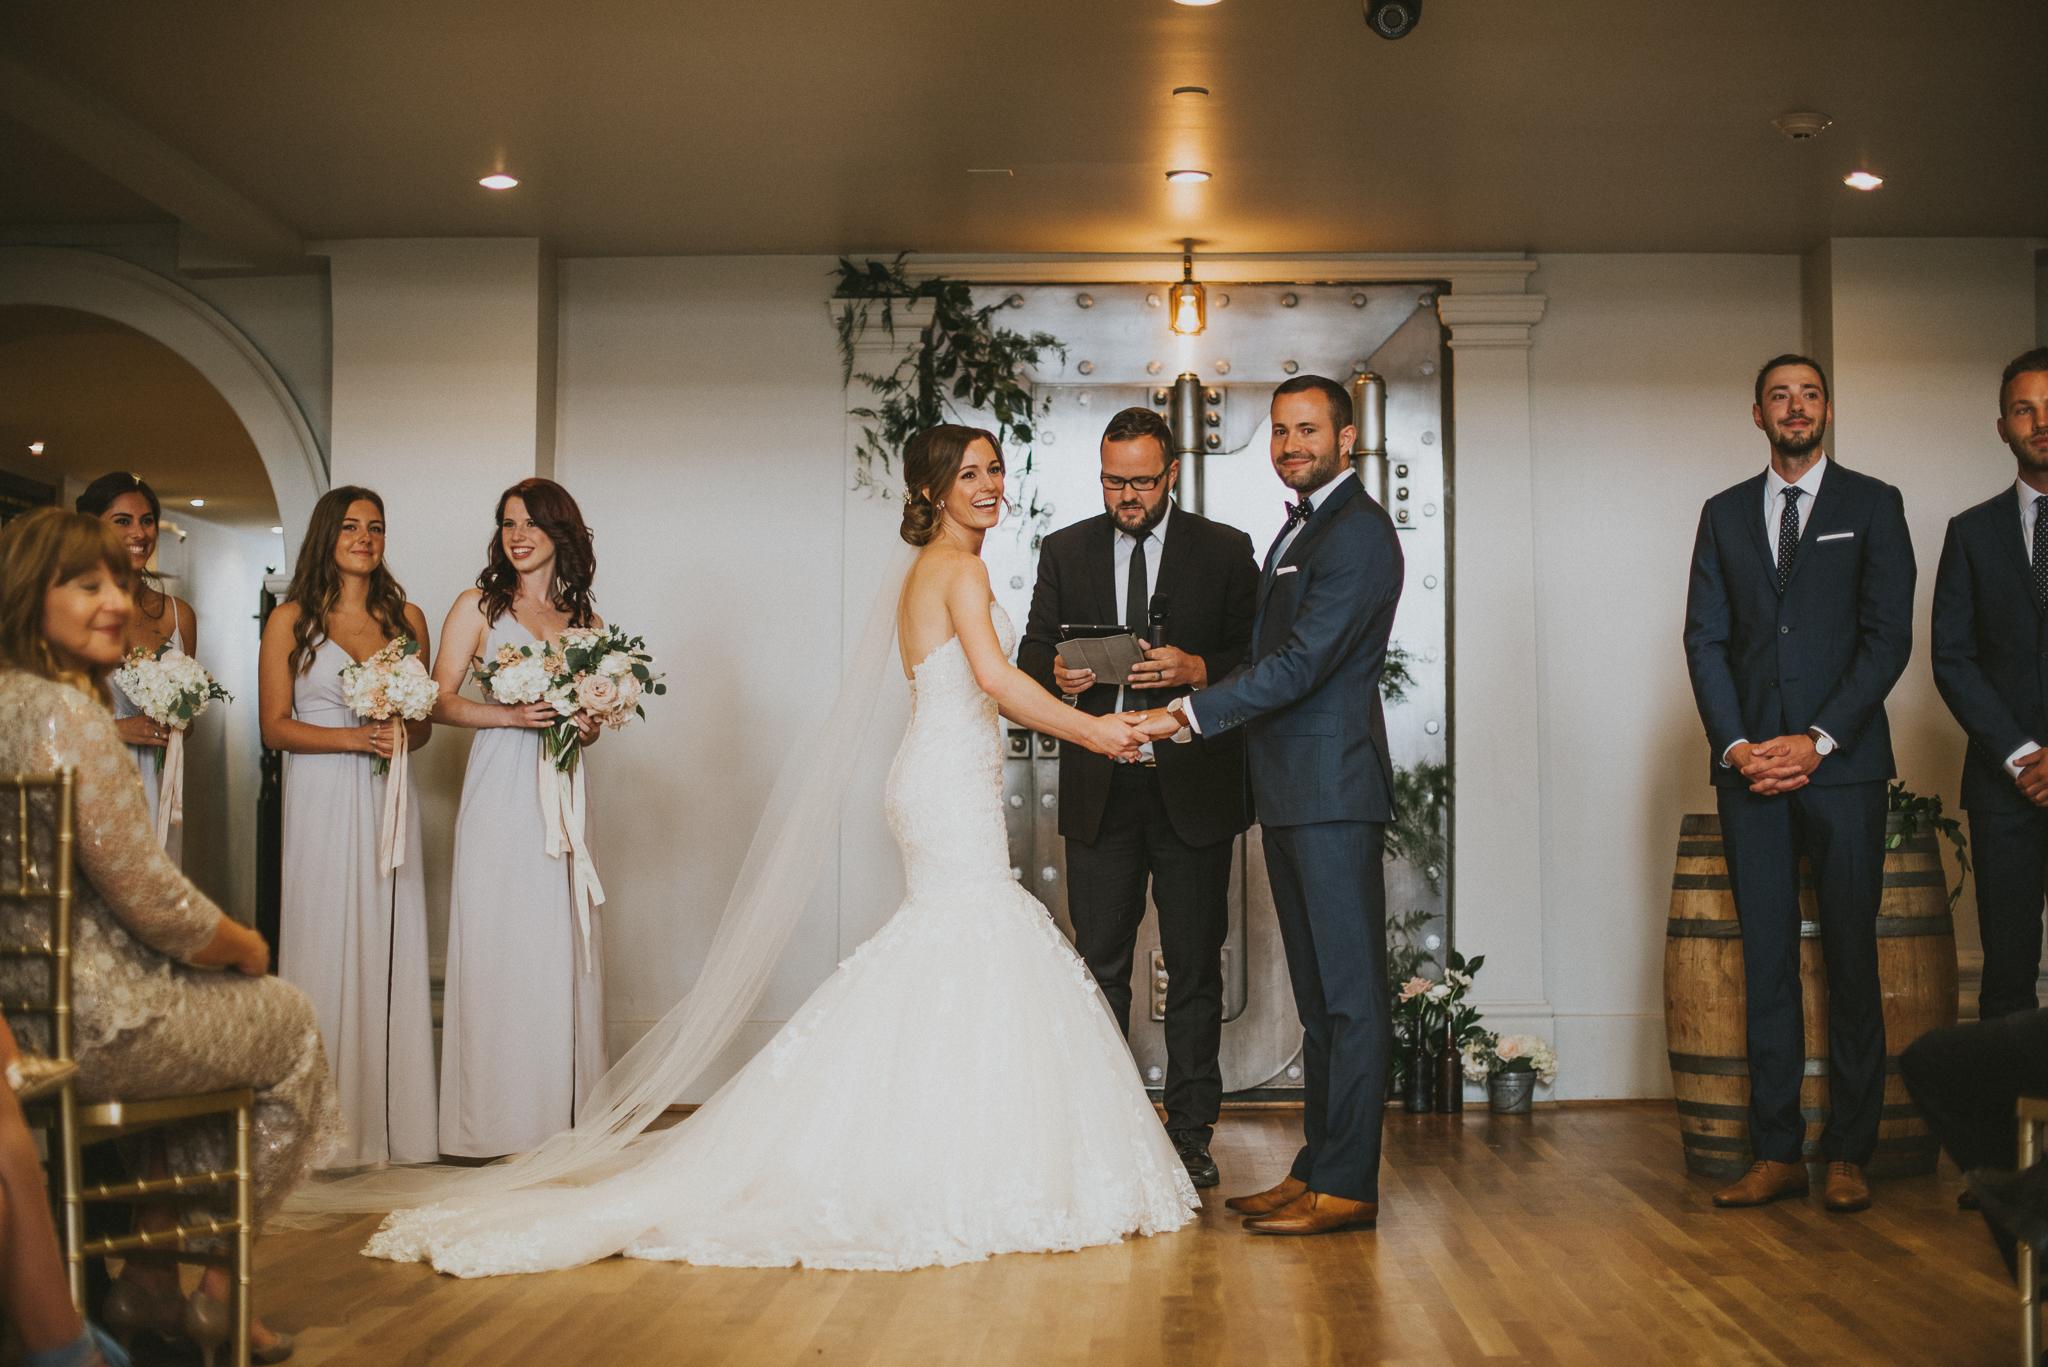 113-permanent-vancouver-wedding-courtneysteven-web-7814.jpg